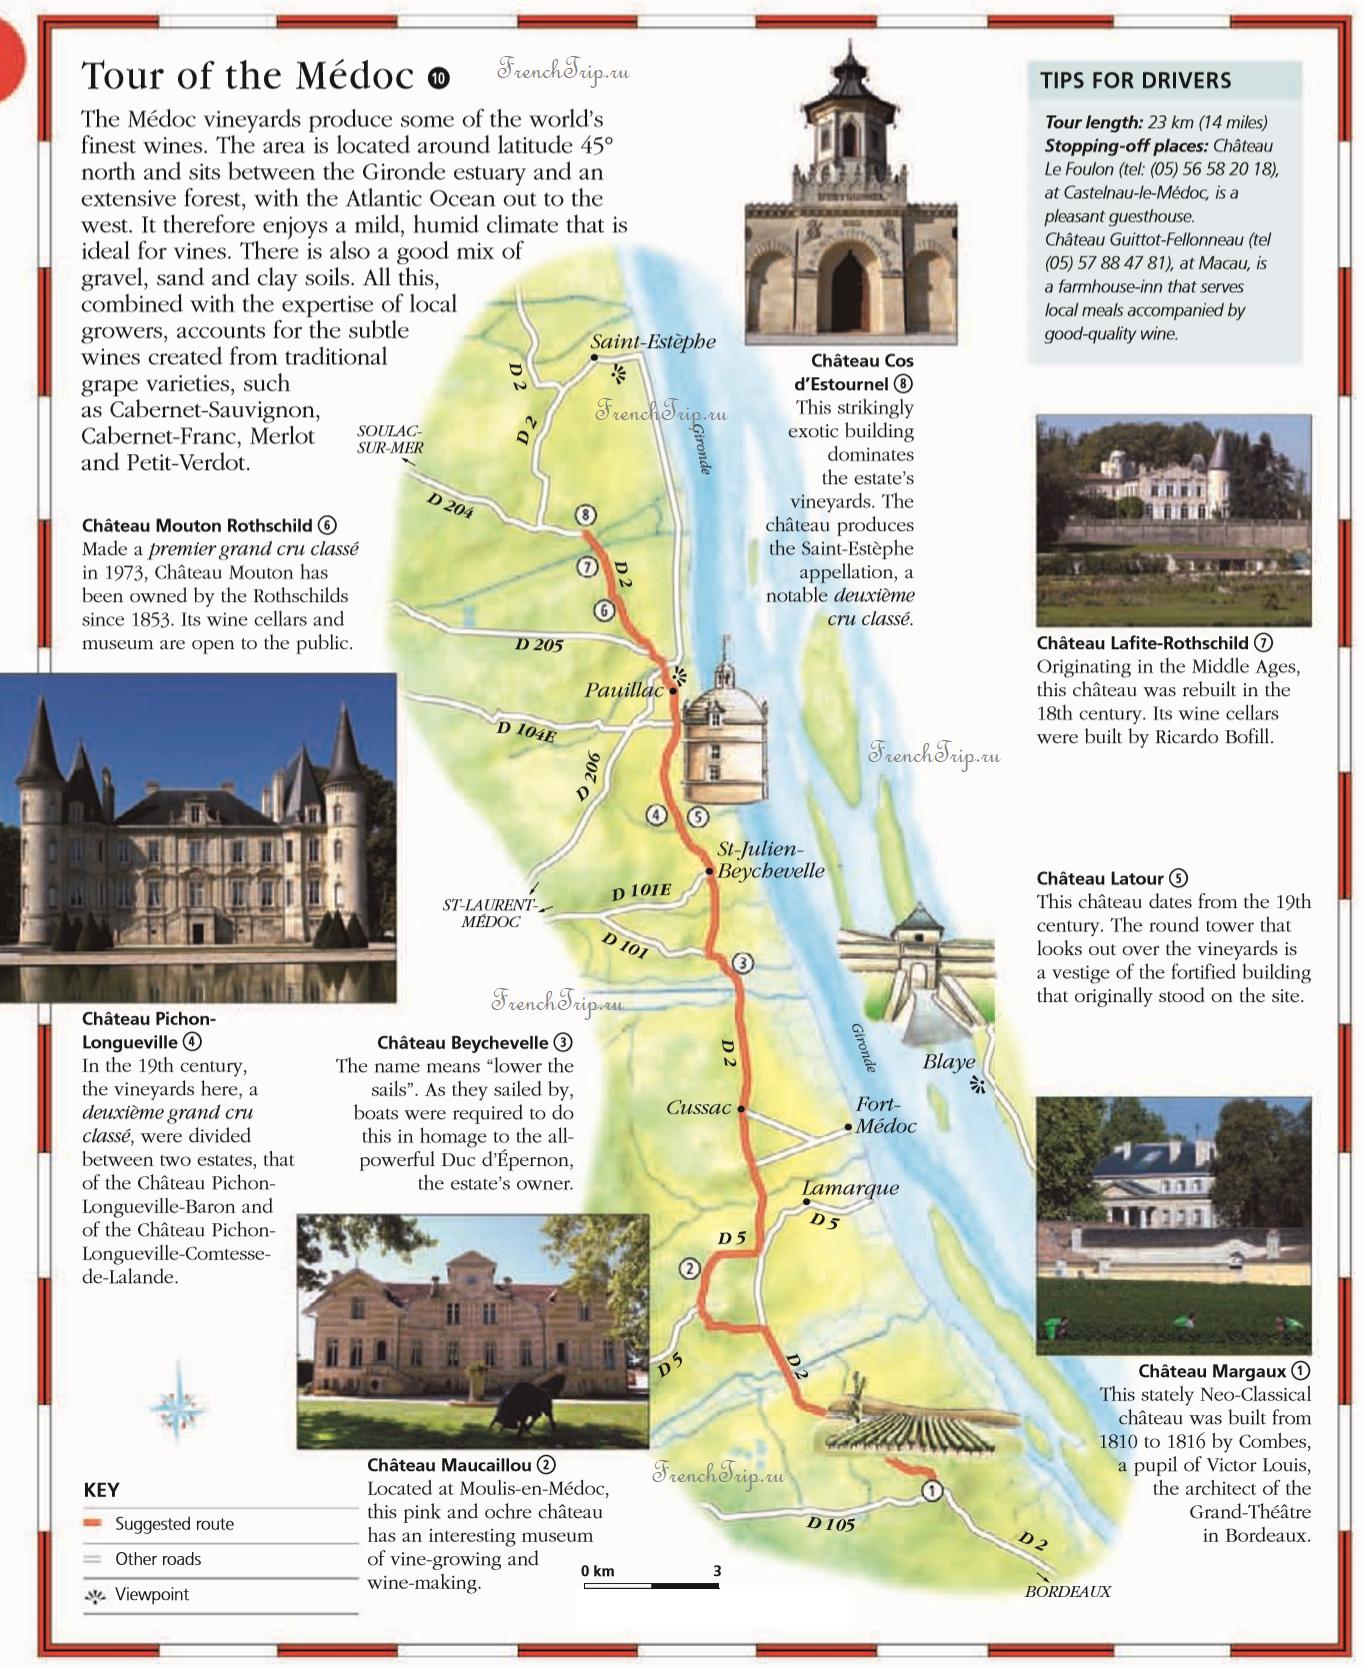 Туристический маршрут по виноградникам Бордо - Медок